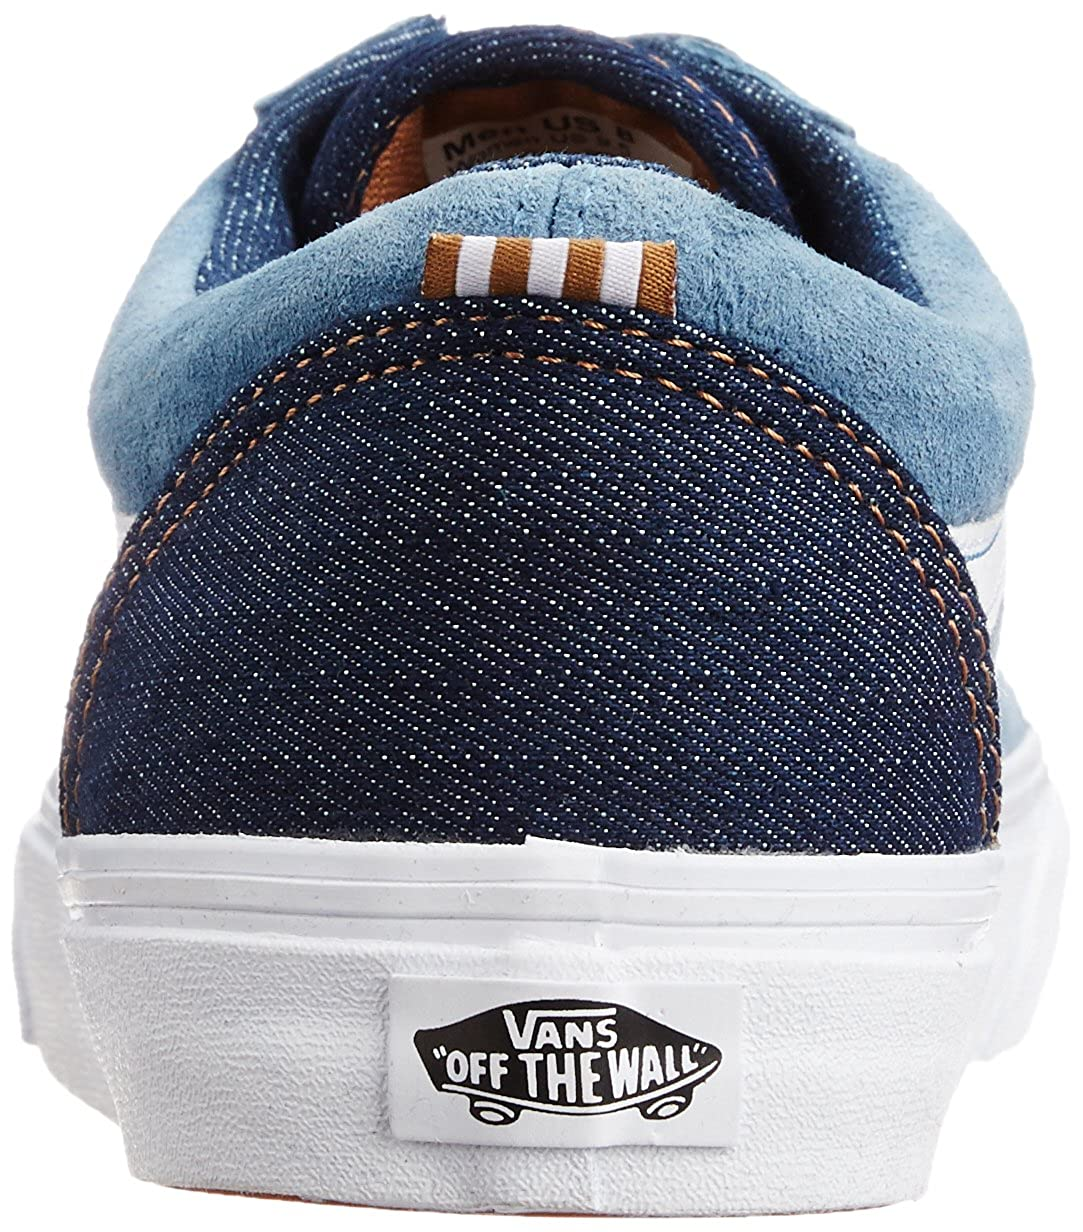 e40800b3c6 Vans Men s Old Skool Reissue Ca Copen Blue Canvas Sneakers - 12 UK  Buy  Online at Low Prices in India - Amazon.in